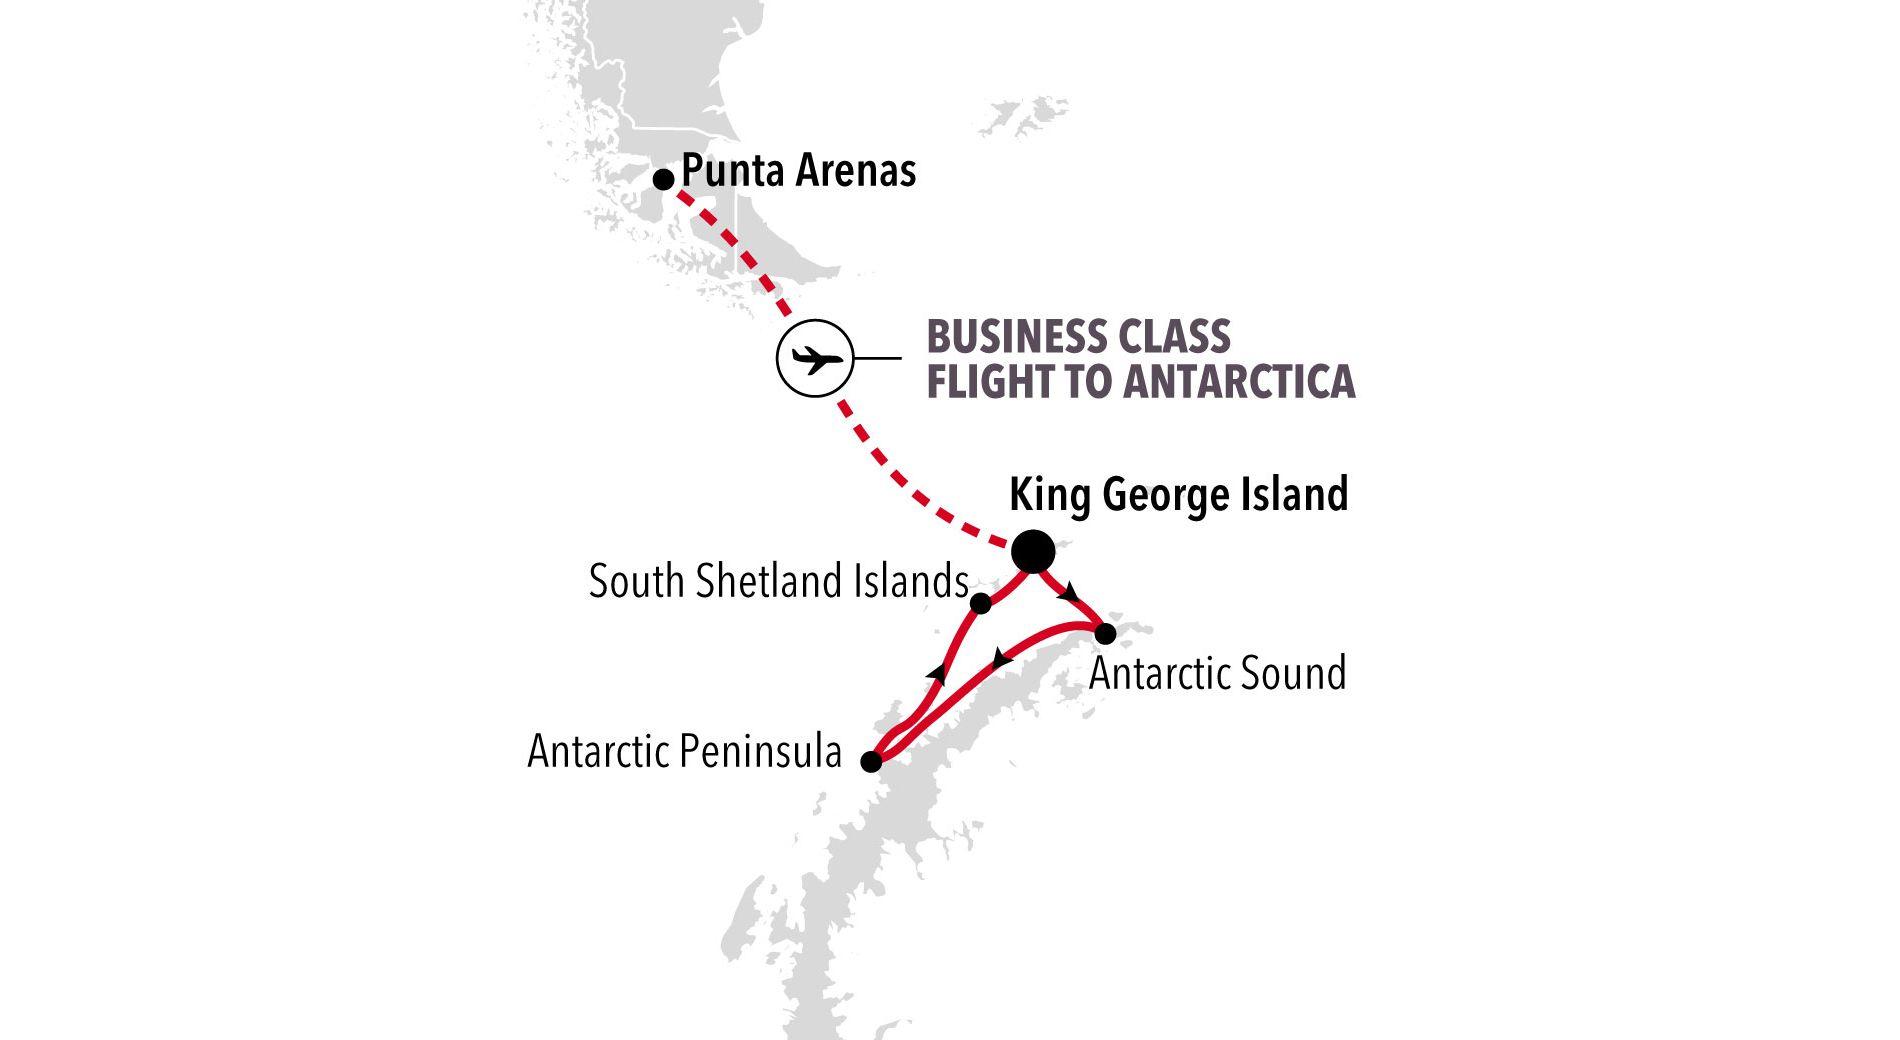 E1220118006 - King George Island a King George Island